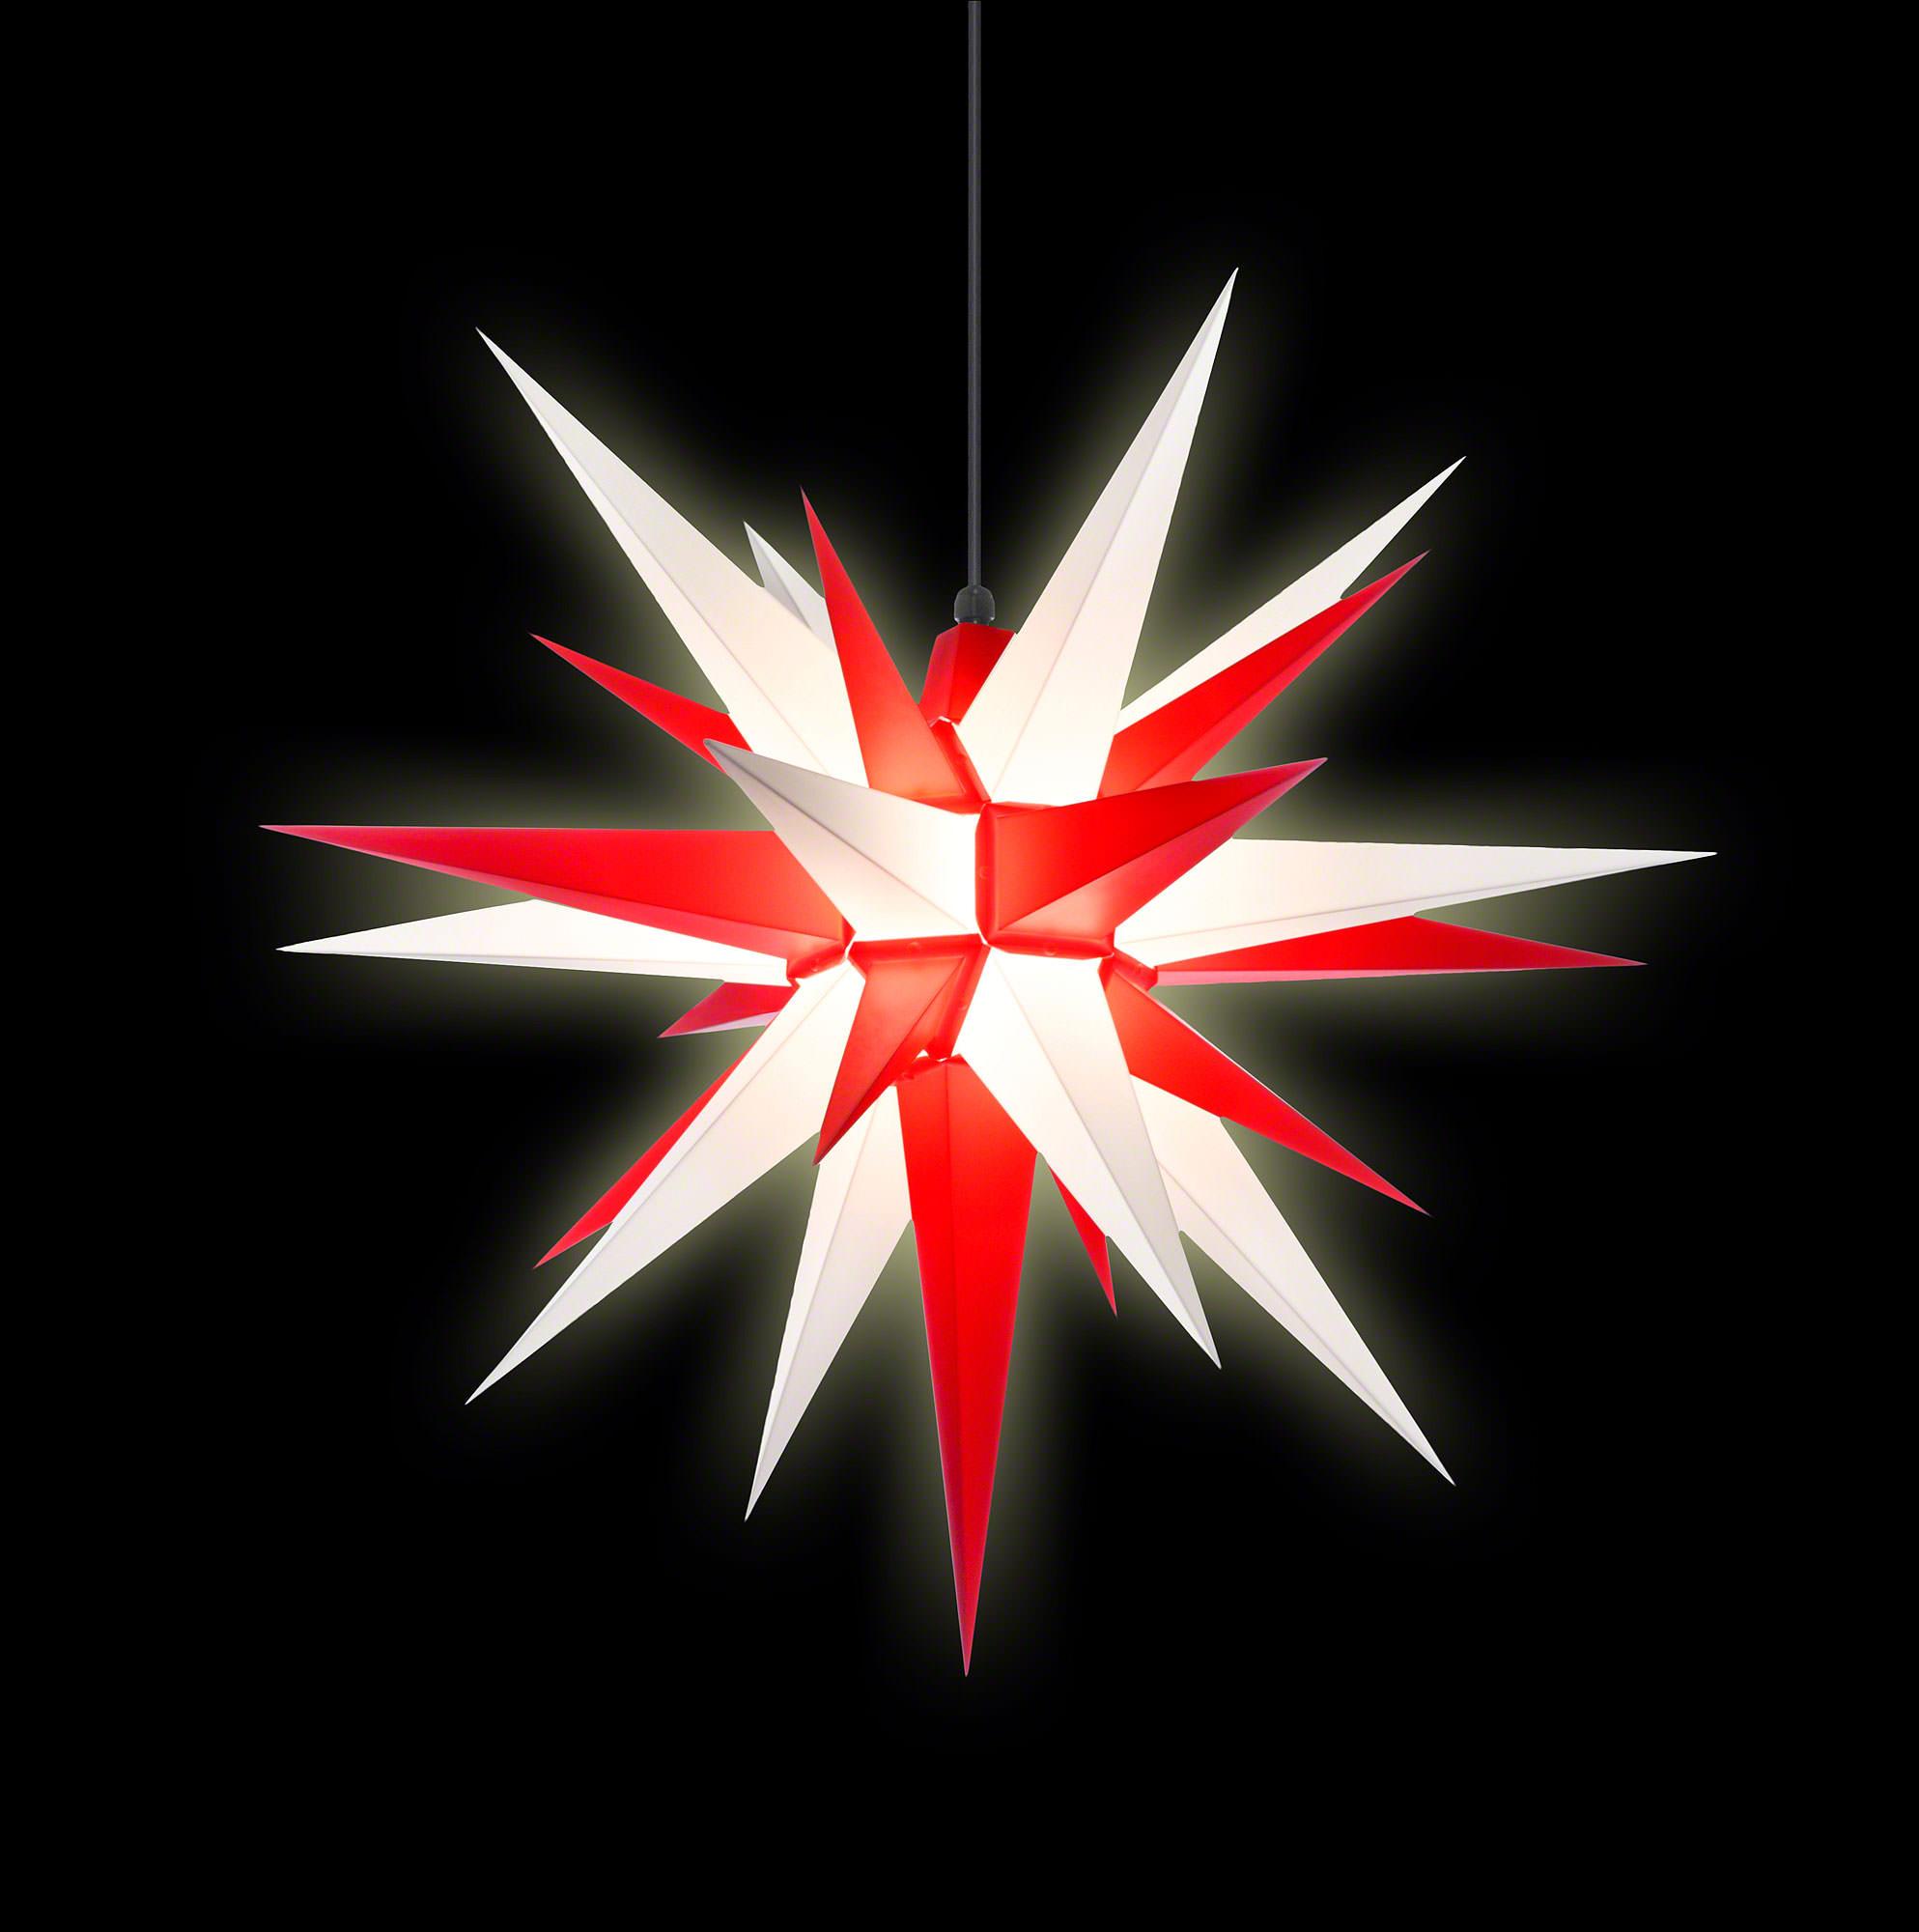 herrnhuter moravian star a7 white red plastic 68cm 27in by herrnhuter sterne. Black Bedroom Furniture Sets. Home Design Ideas